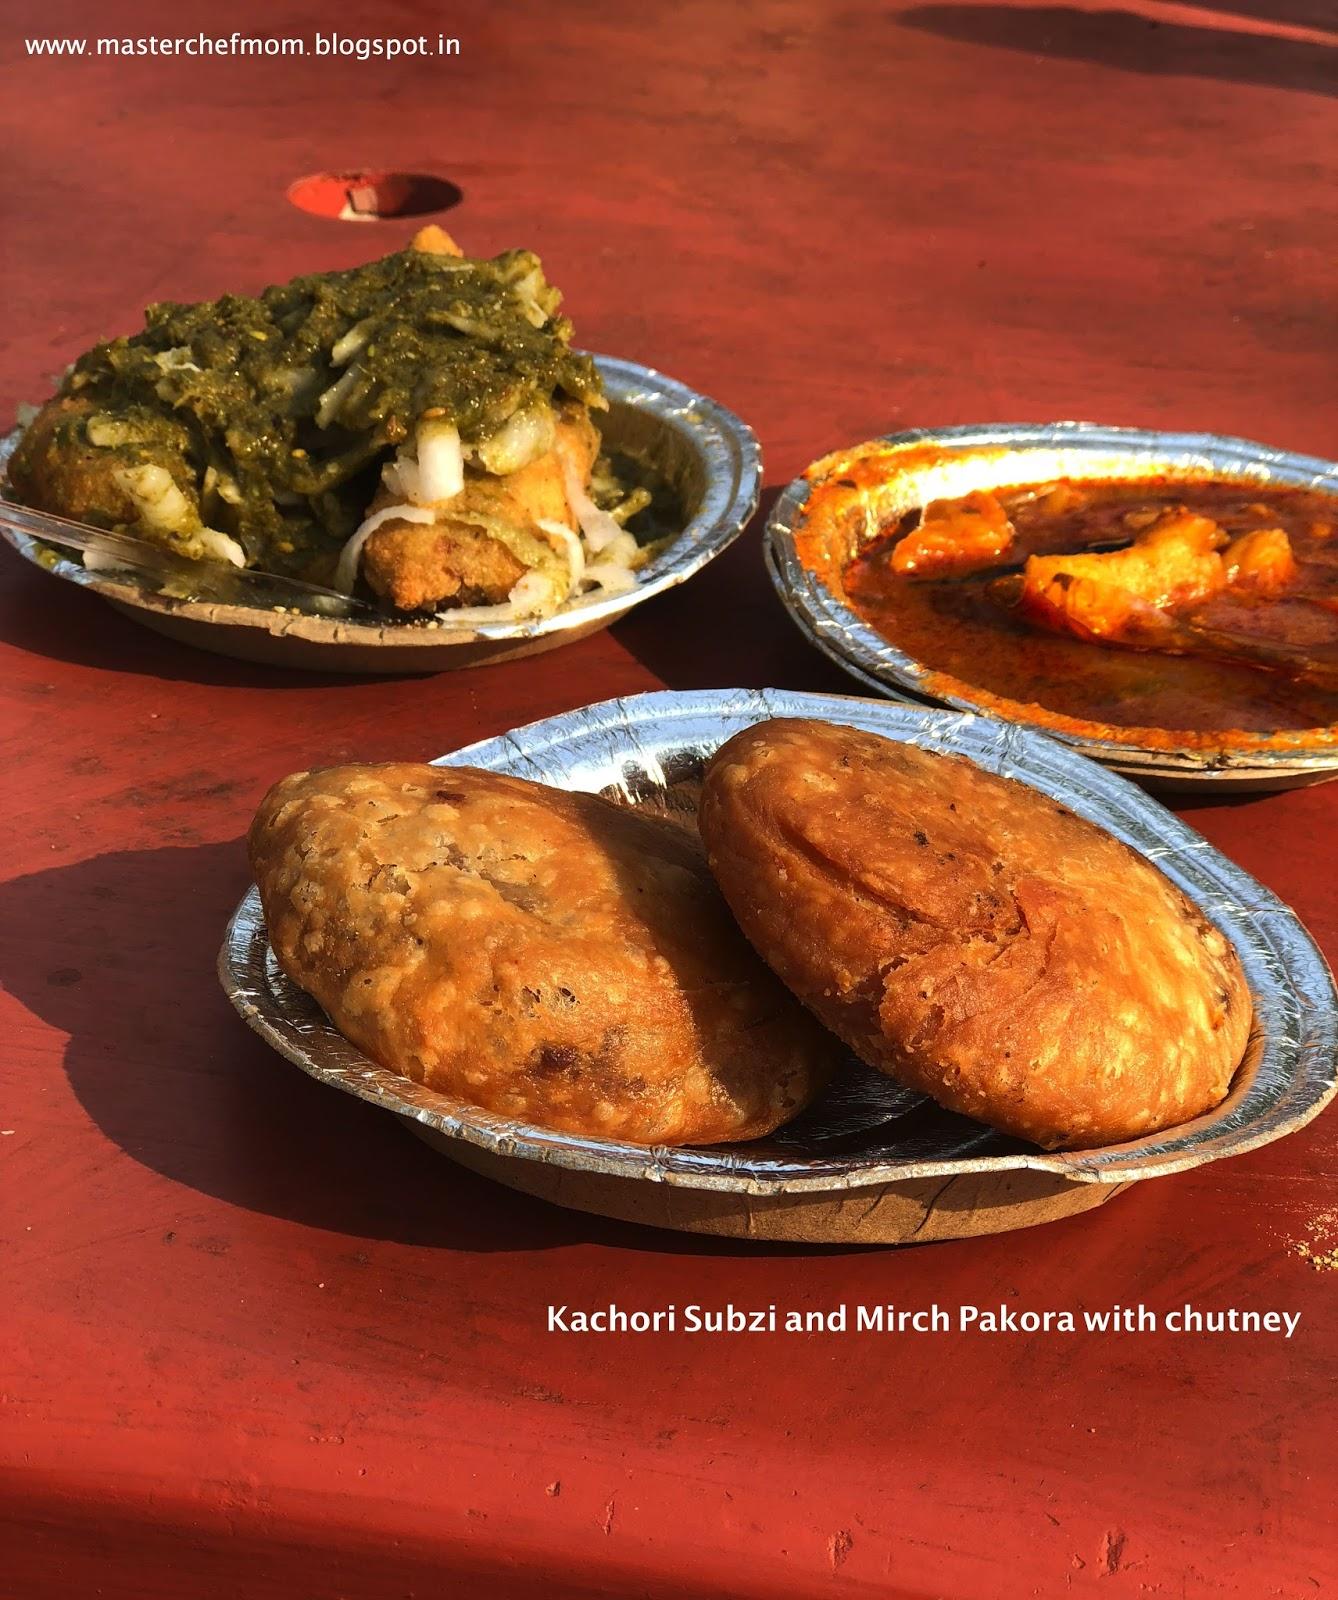 Masterchefmom paruppu podi recipe lentil powder recipe let me now share about todays recipe paruppu in tamil language means lentil and podi means powder this paruppu podi is a must have condiment in forumfinder Images